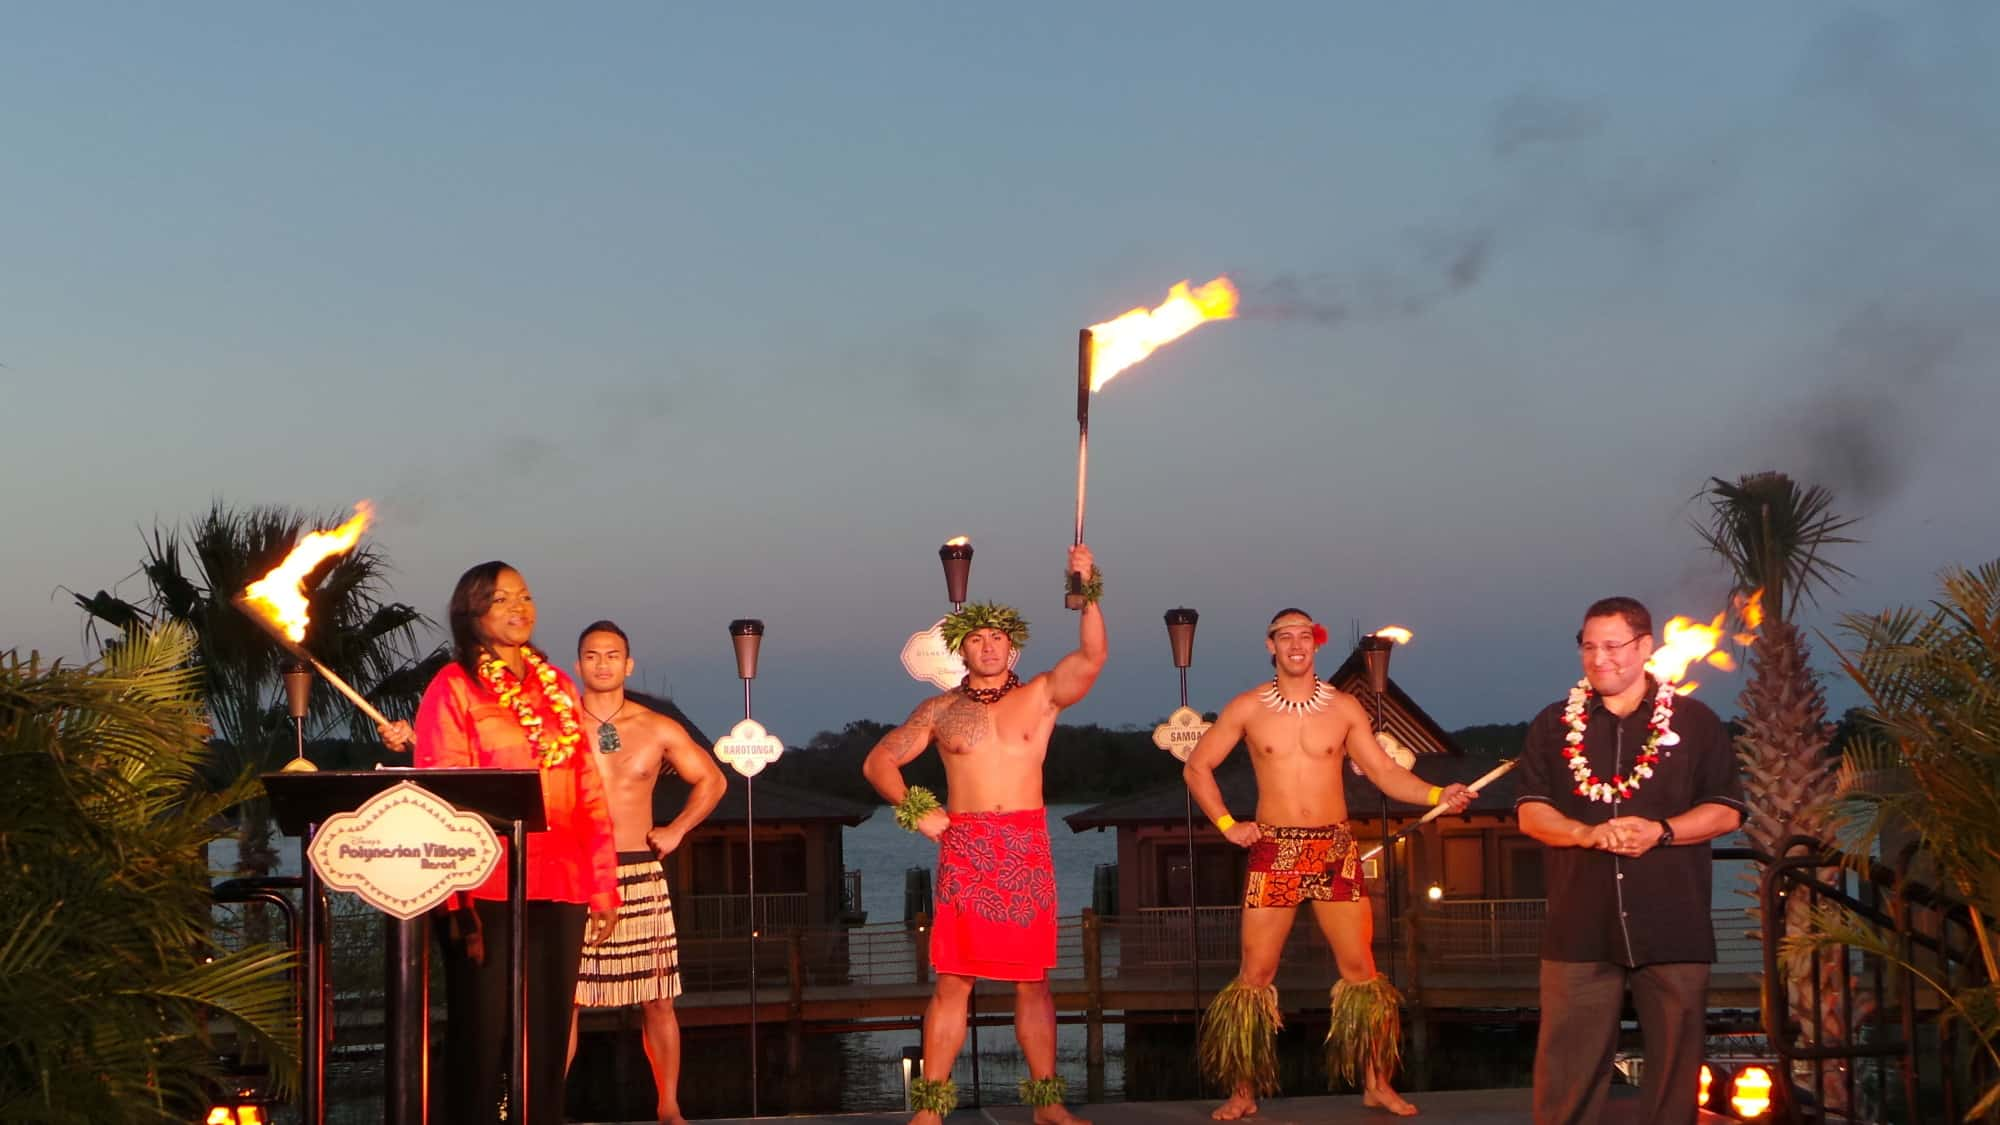 Opening ceremony torch lighting